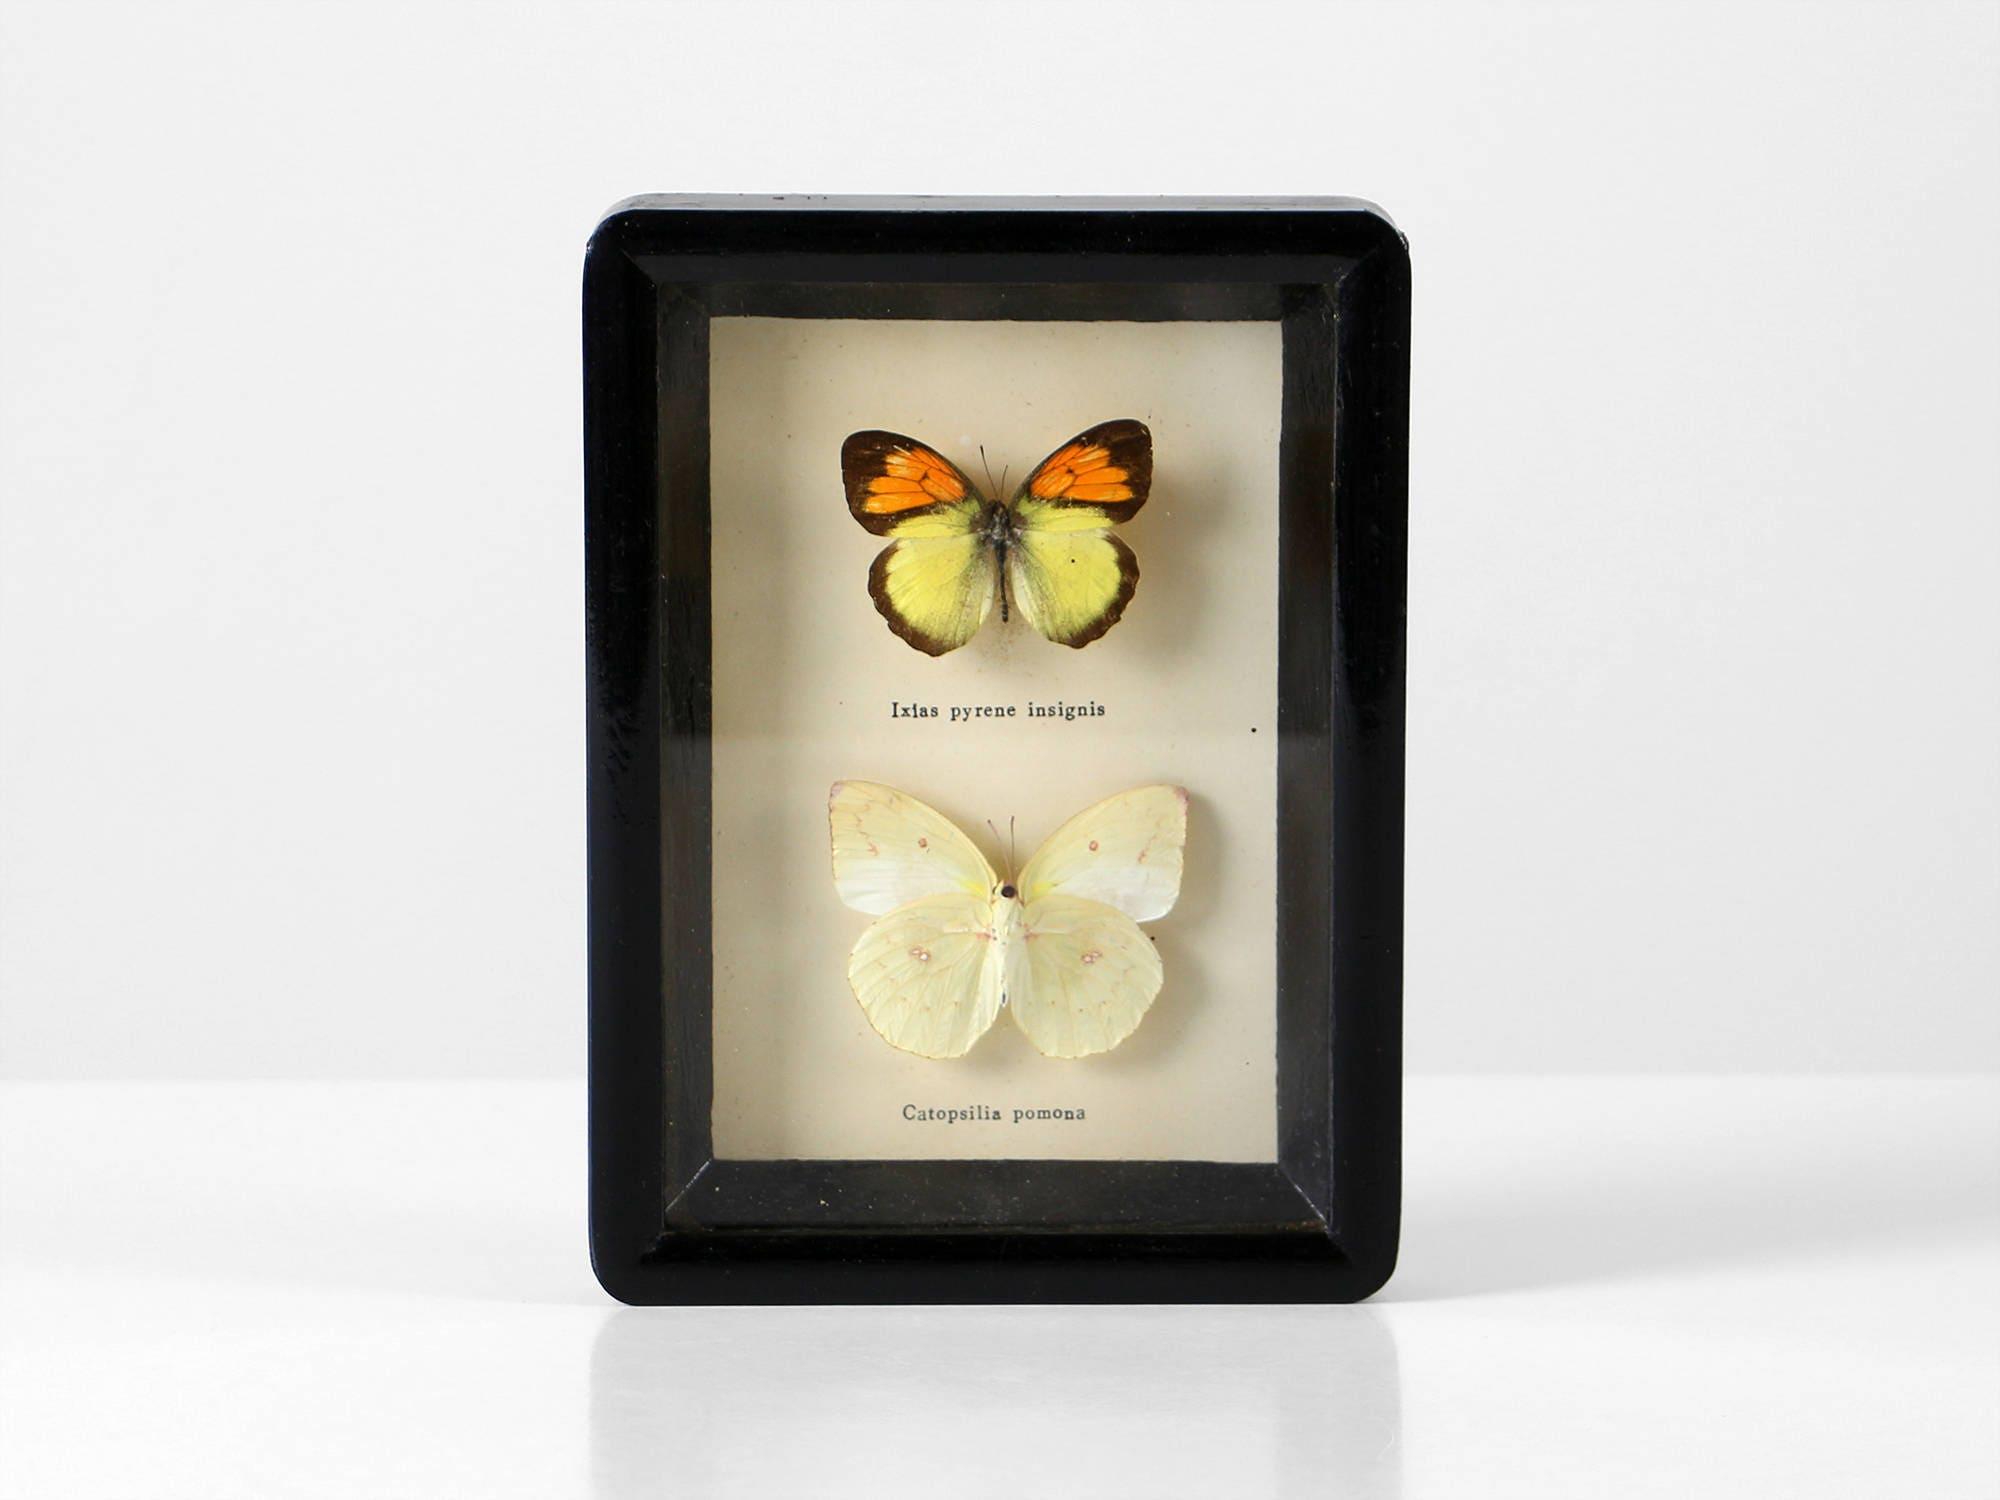 Gerahmte Schmetterling Sammlung vintage Schmetterlinge Decor | Etsy